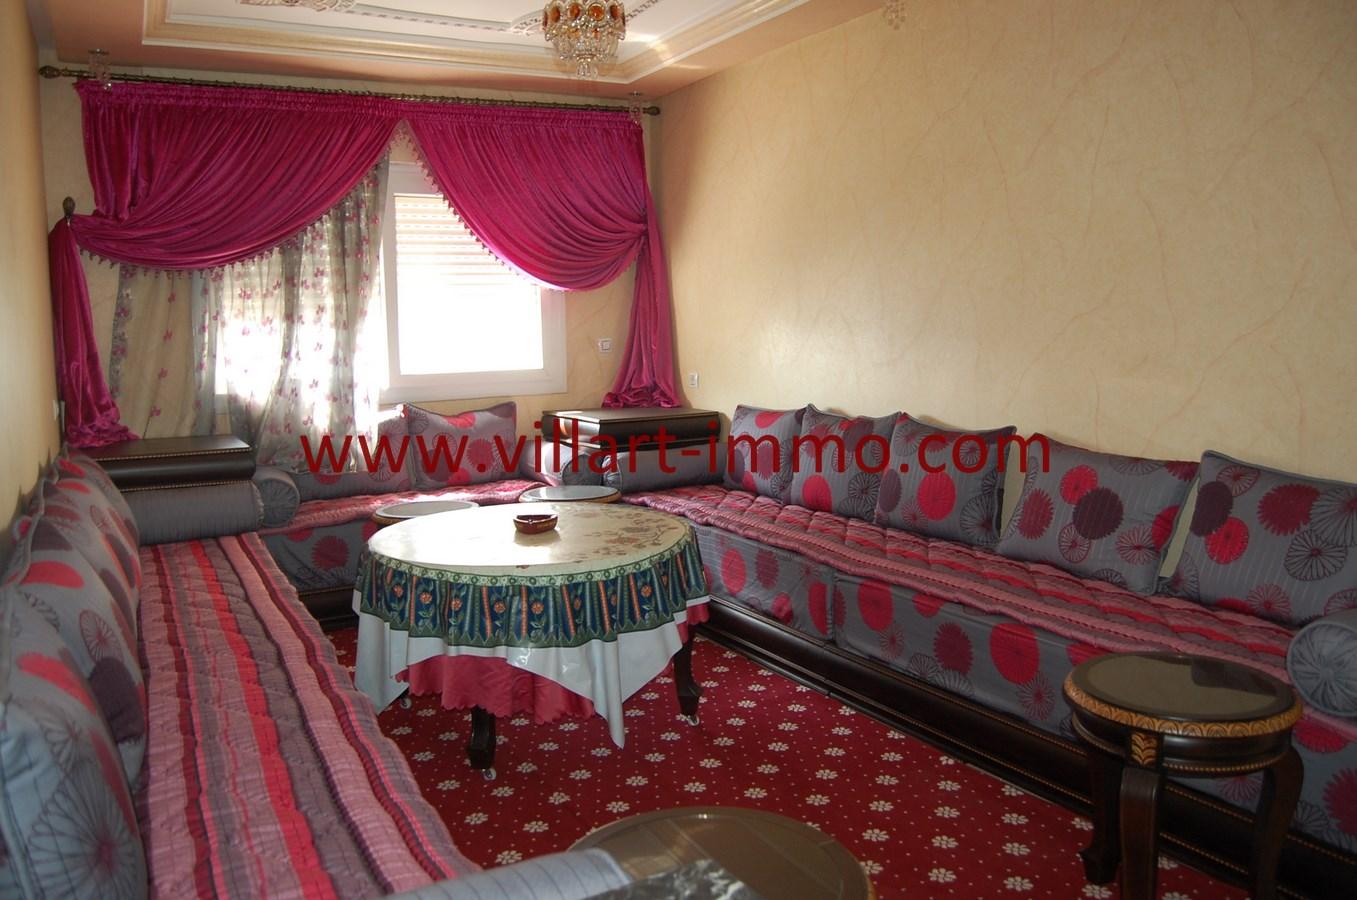 1-Vente-Appartement-Tanger-Malabata-Salon-VA486-Villart Immo